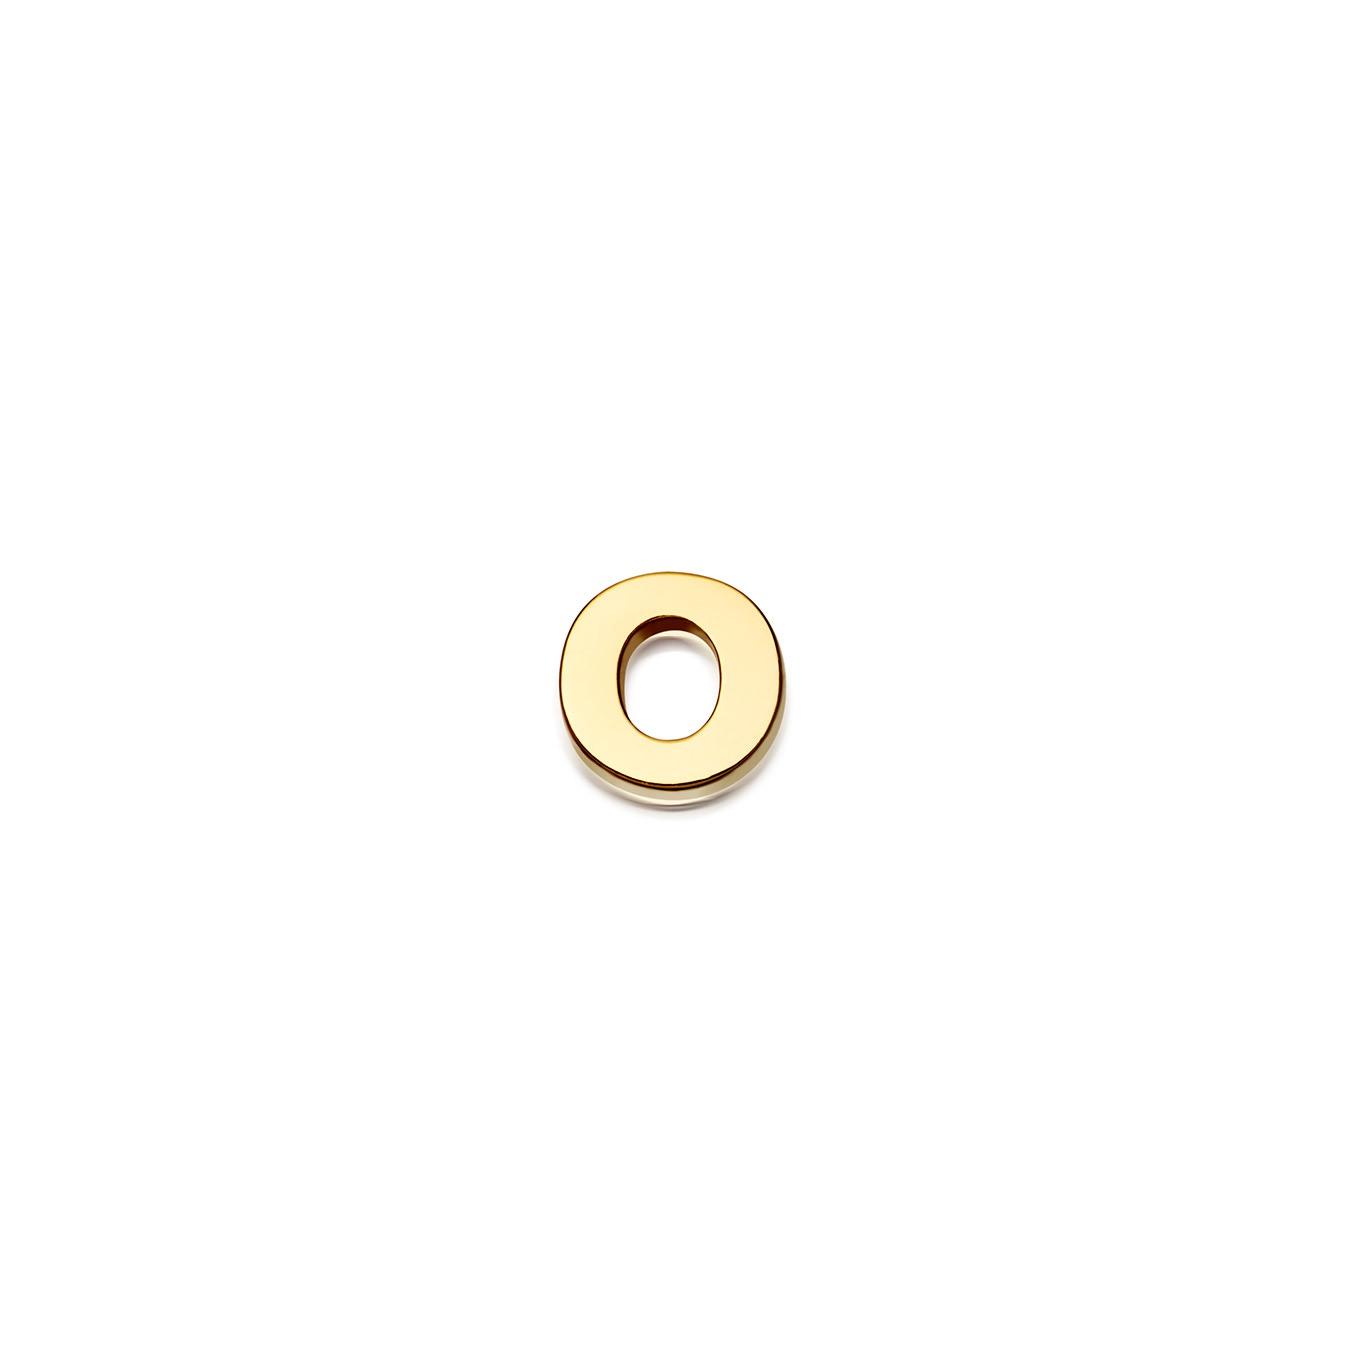 Initial 'O' Alphabet Pin